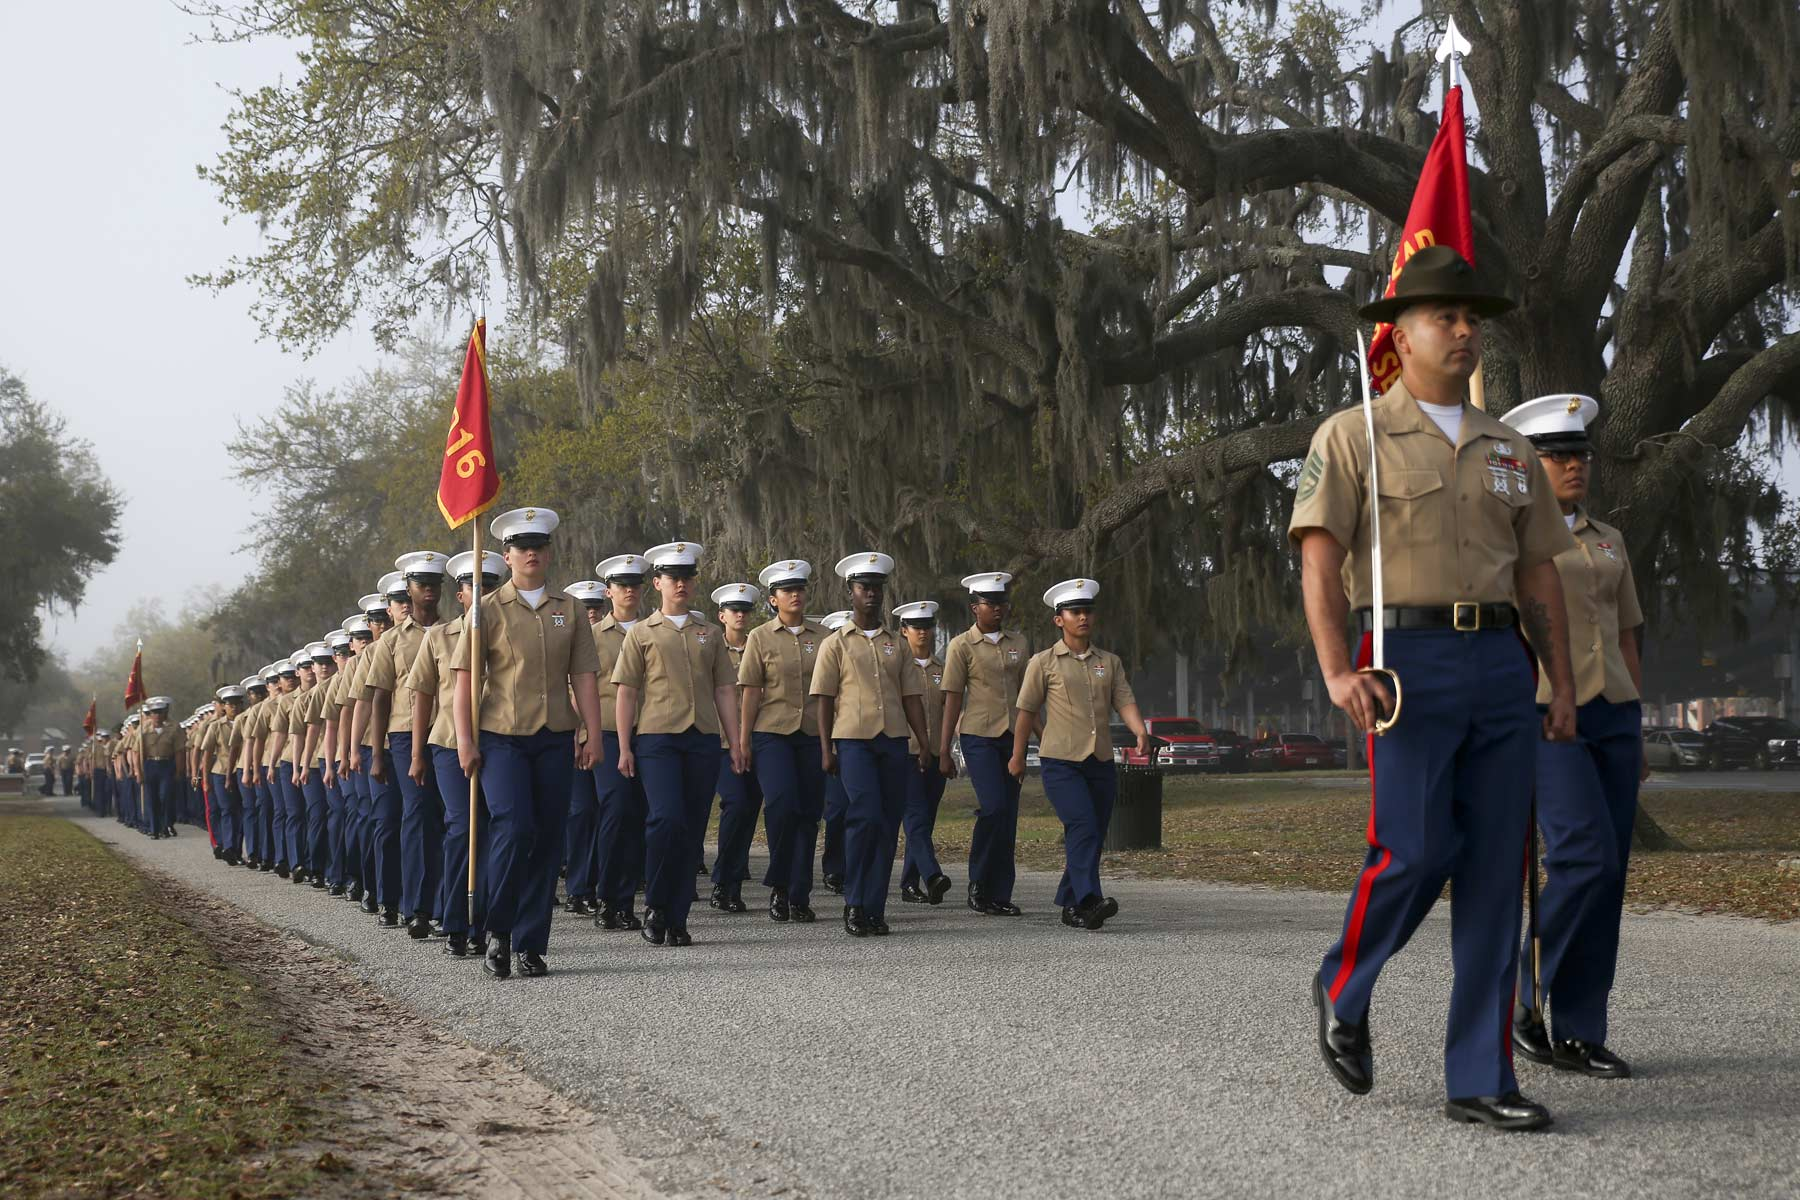 First Marine Co Ed Boot Camp Company Graduates At Parris Island